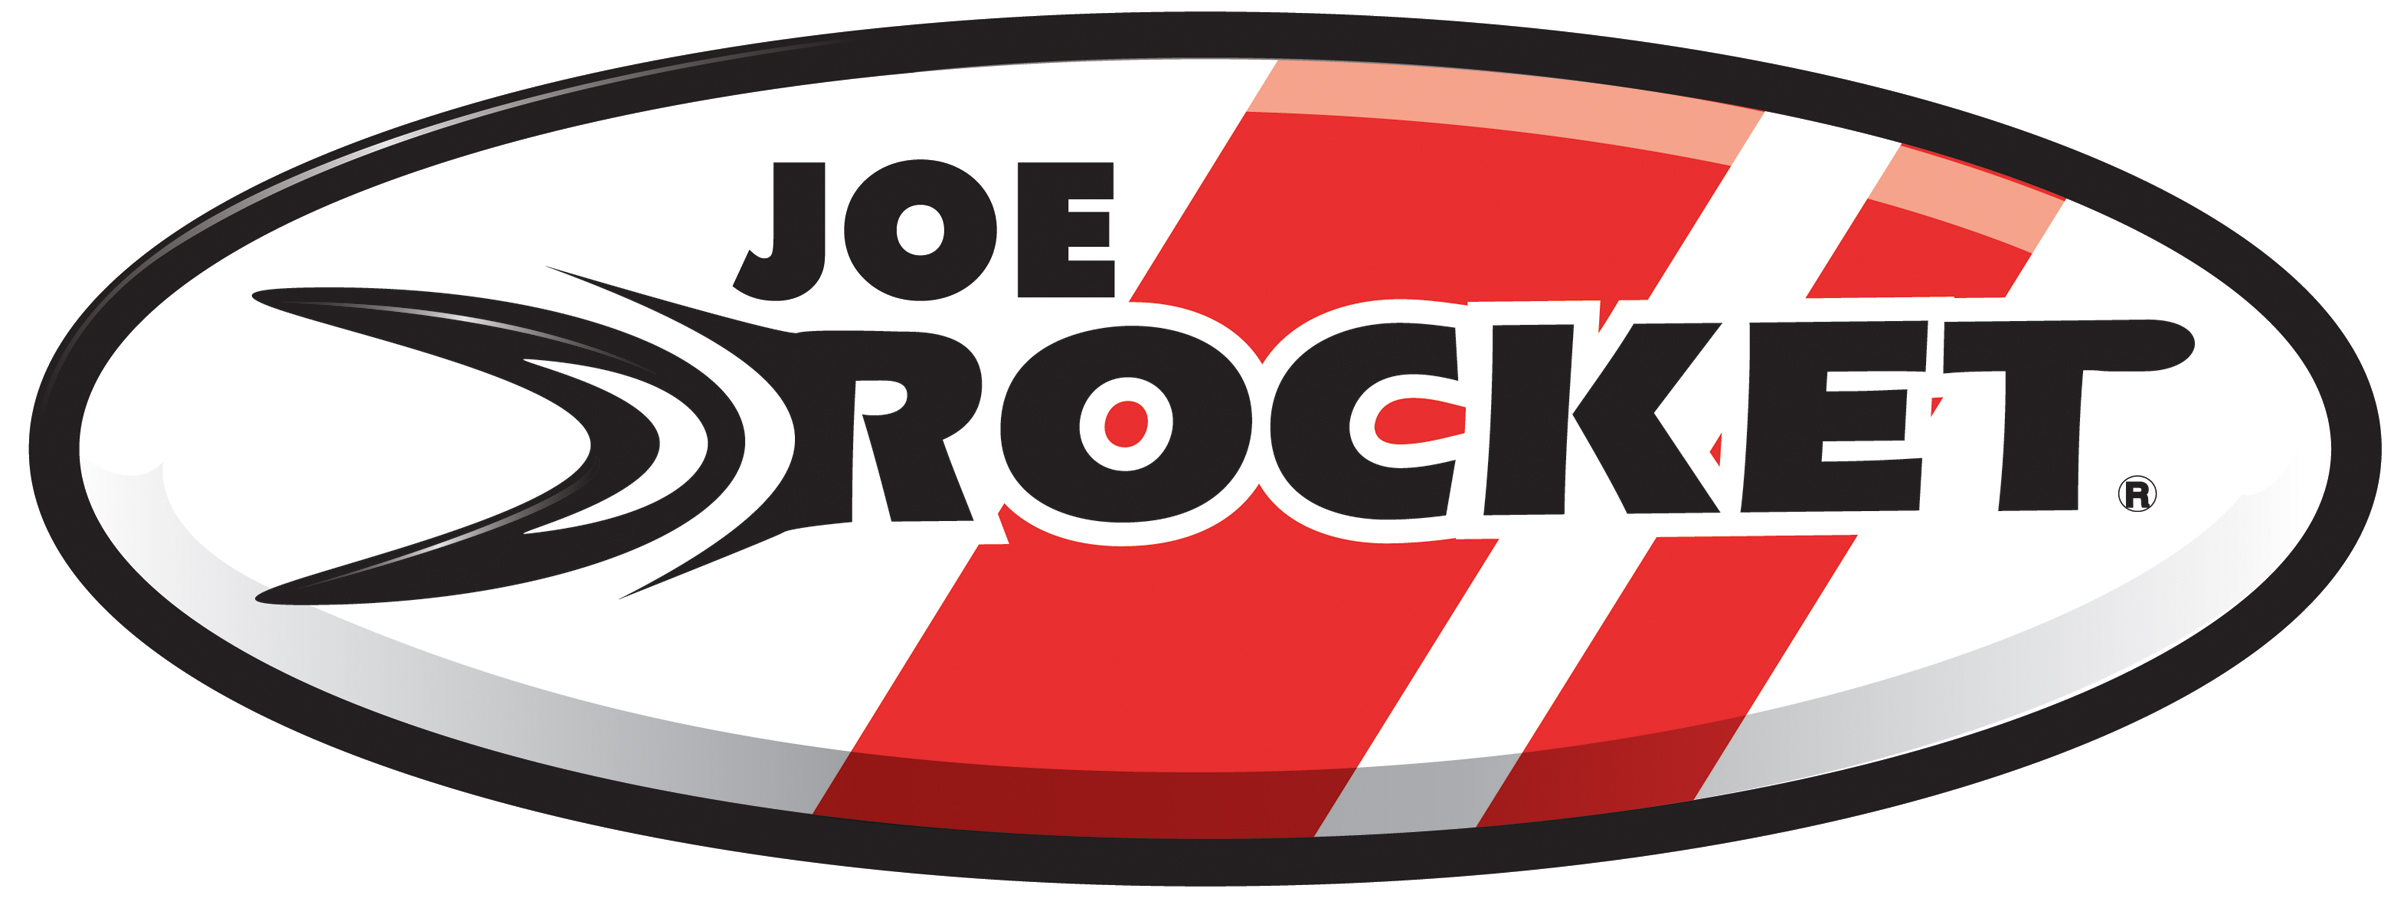 joe-rocket-logo-hi-res.jpg